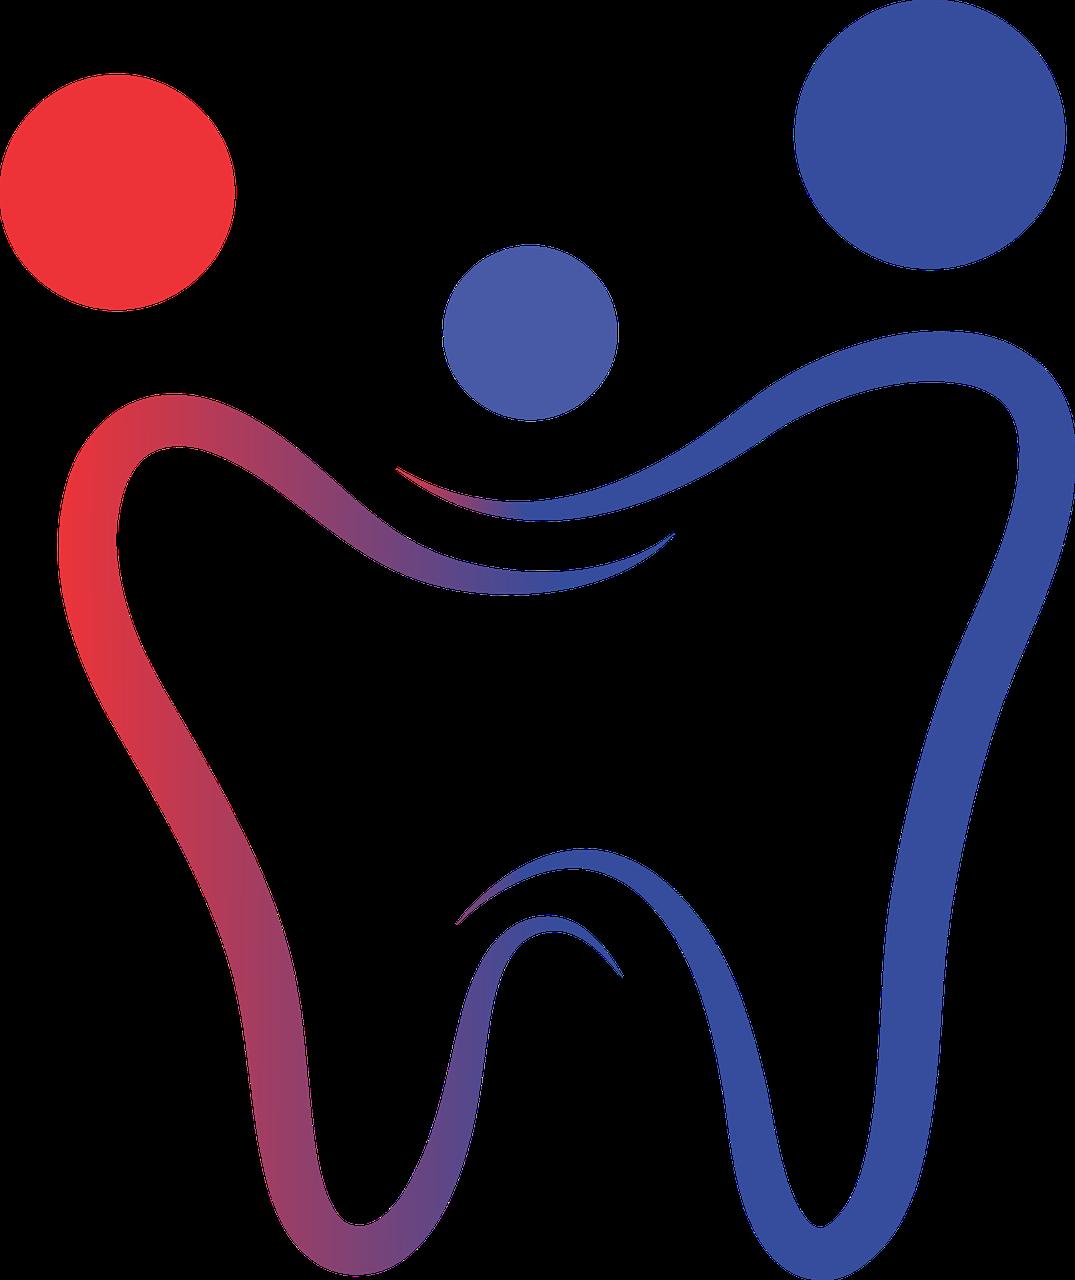 Patzke Tandartspraktijk K M wanneer spoed tandarts